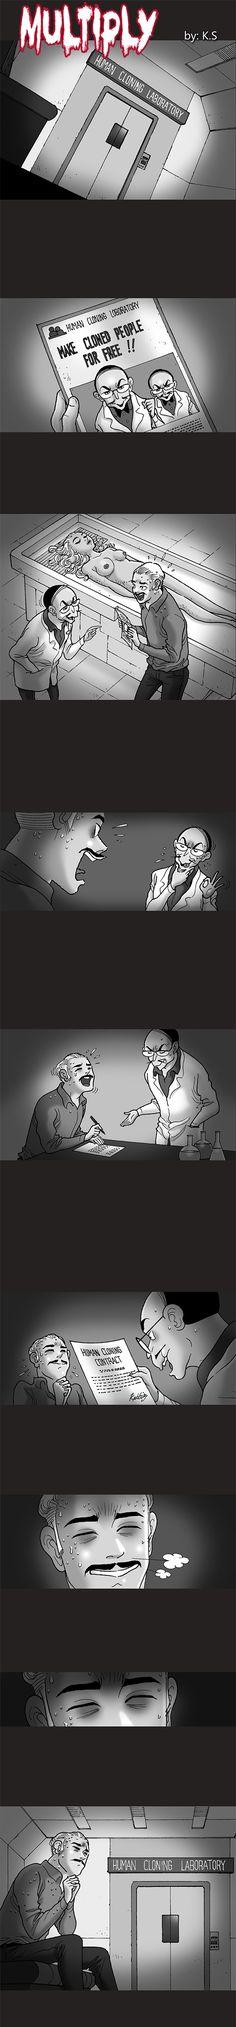 Silent Horror chap 245: Multiply - Nhân bản